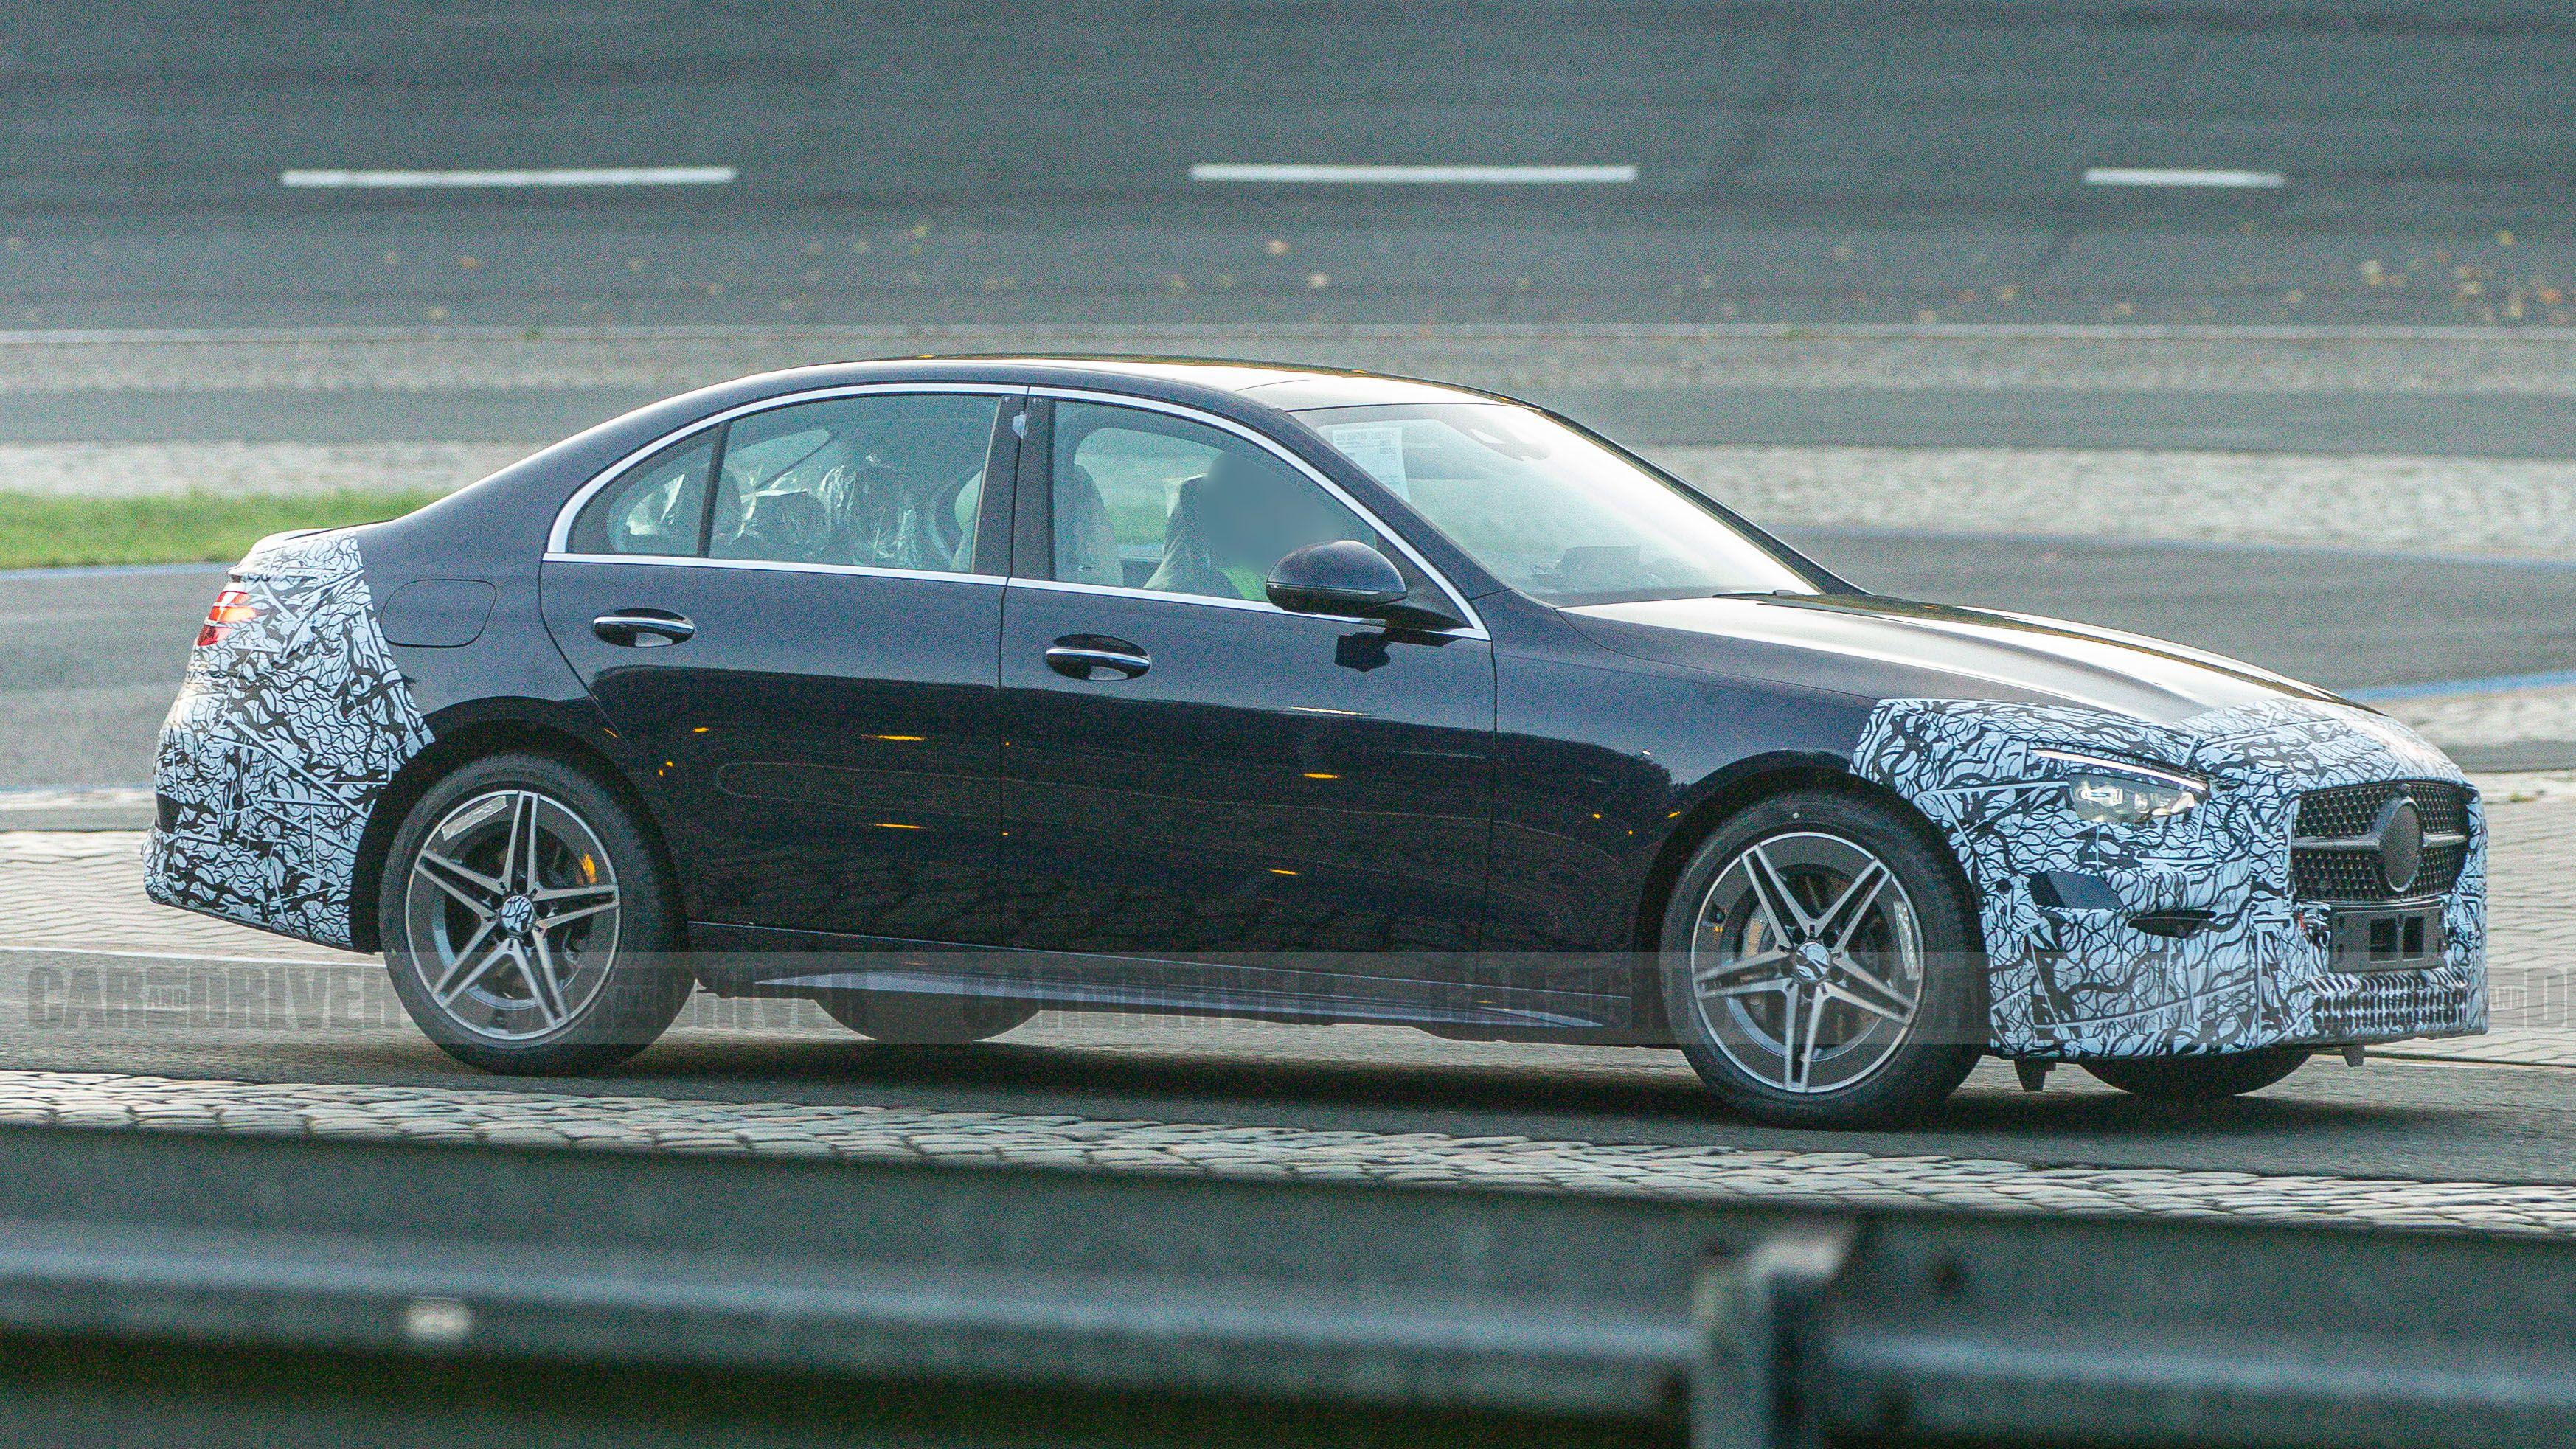 2022 Mercedes Benz C Class Shows Off Its New Look